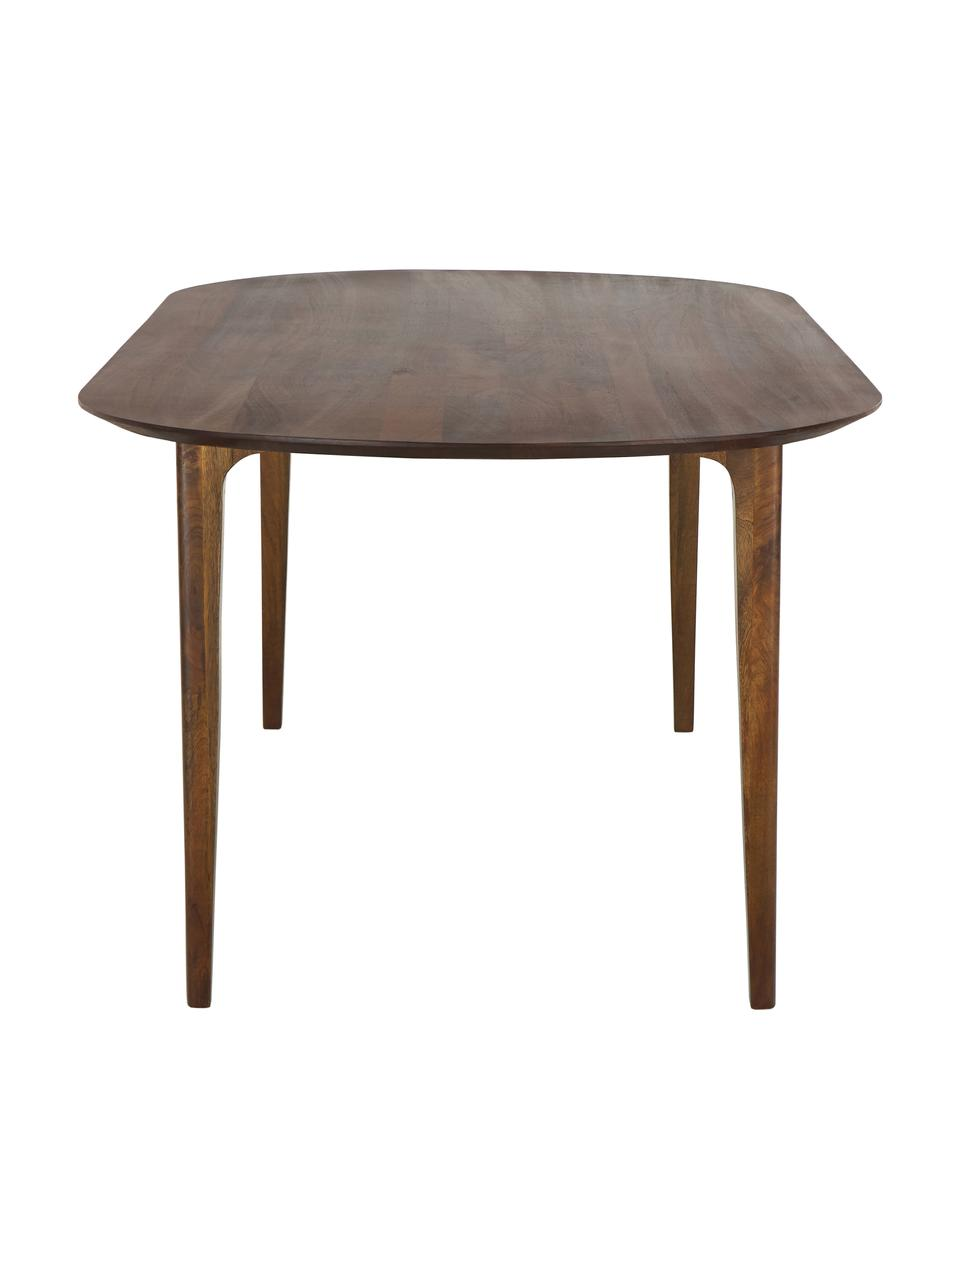 Ovale massief houten eettafel Archie, Gelakt massief mangohout, Mangohout, donker gelakt, B 200 x D 100 cm